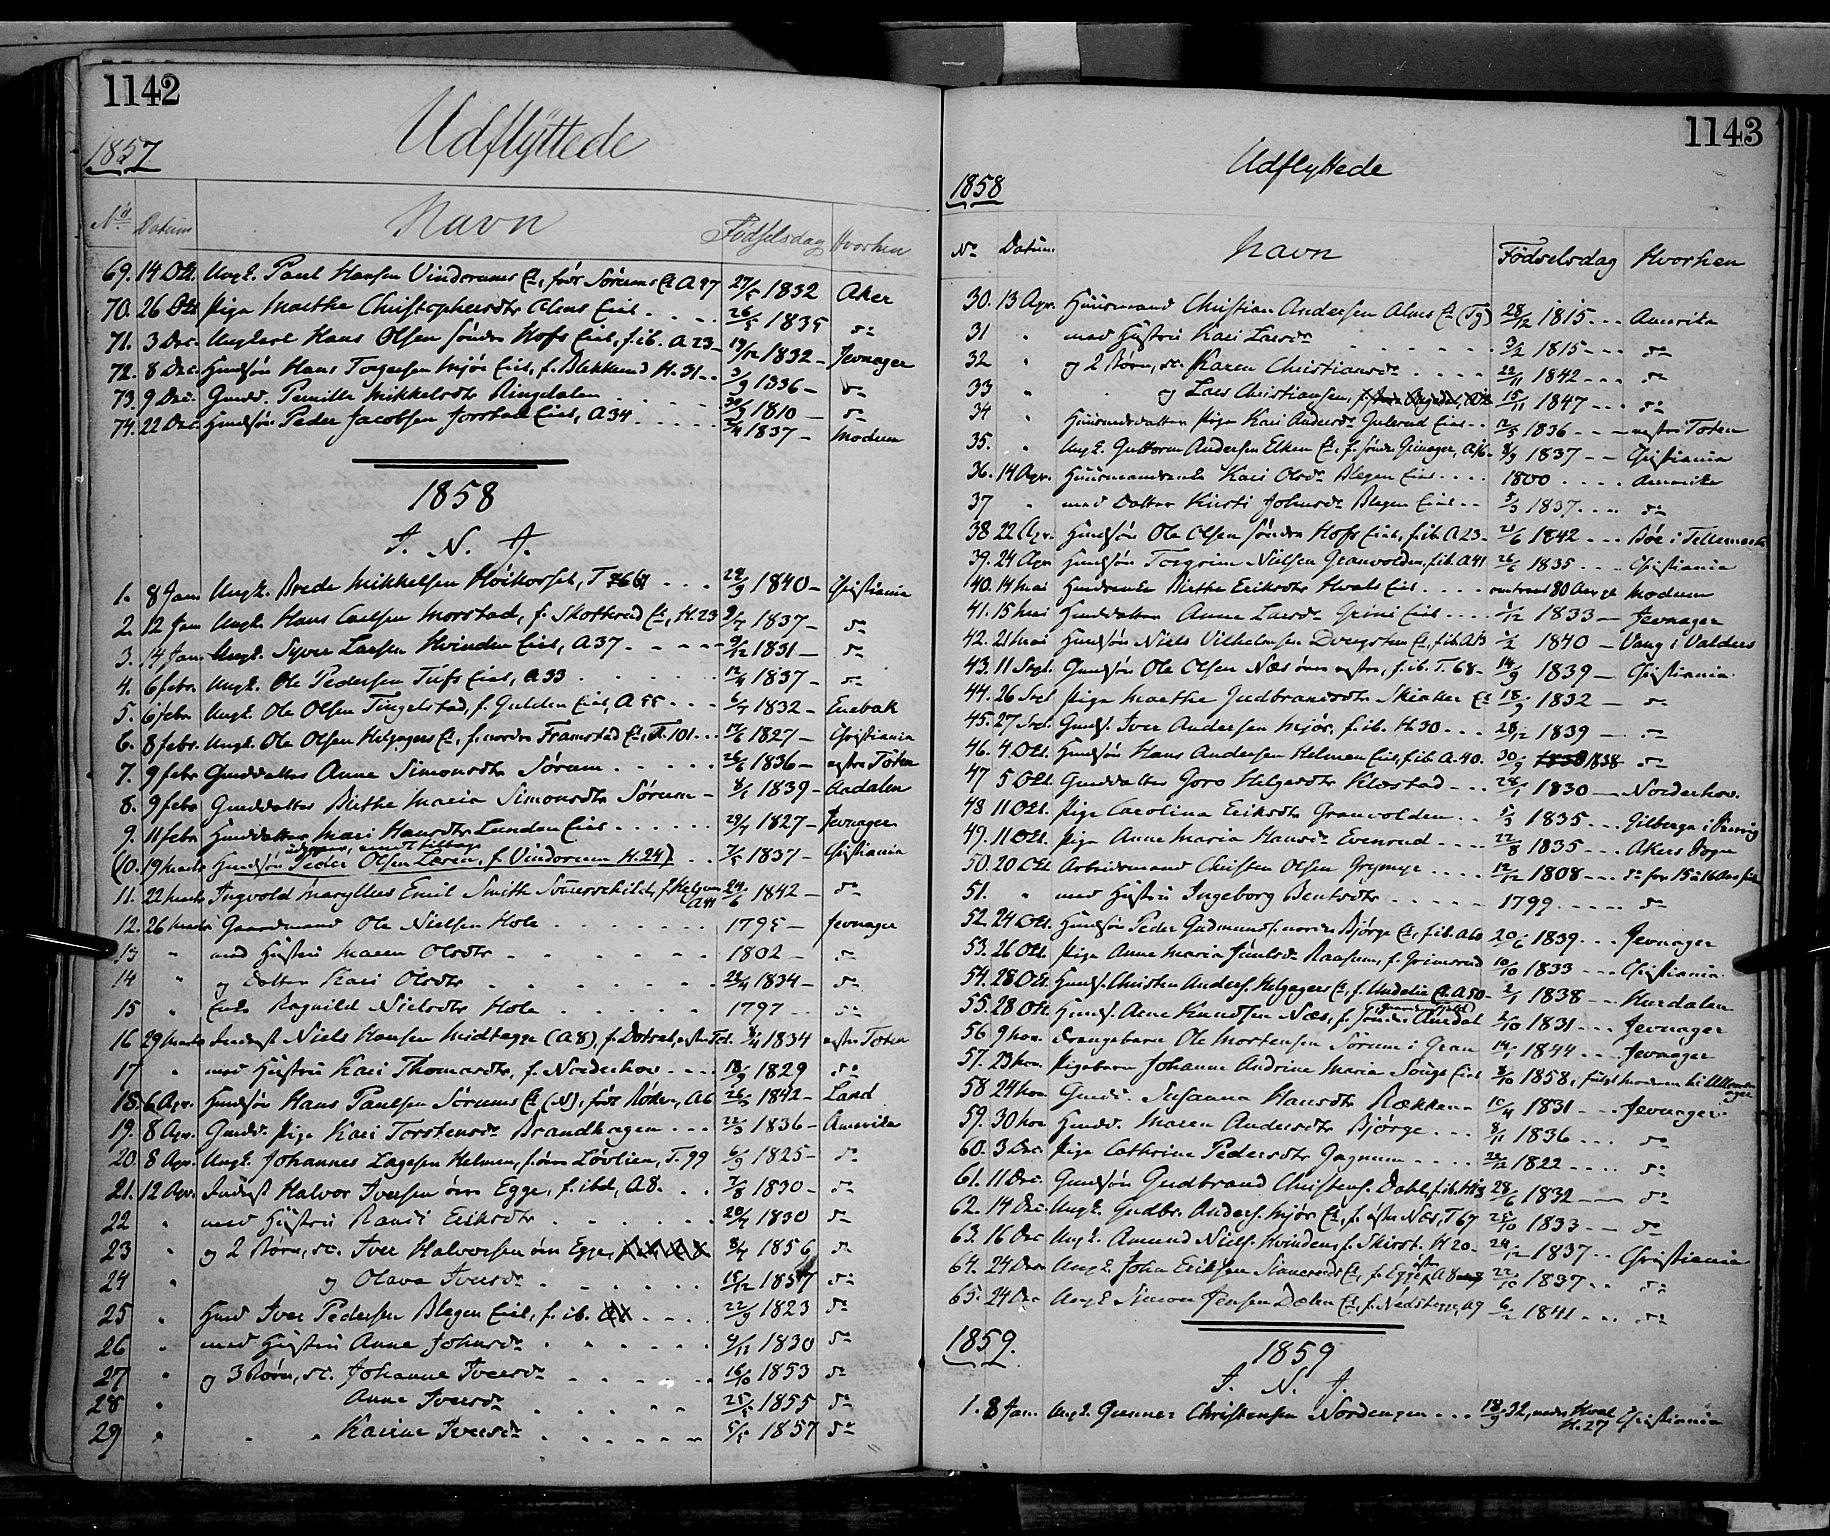 SAH, Gran prestekontor, Ministerialbok nr. 12, 1856-1874, s. 1142-1143